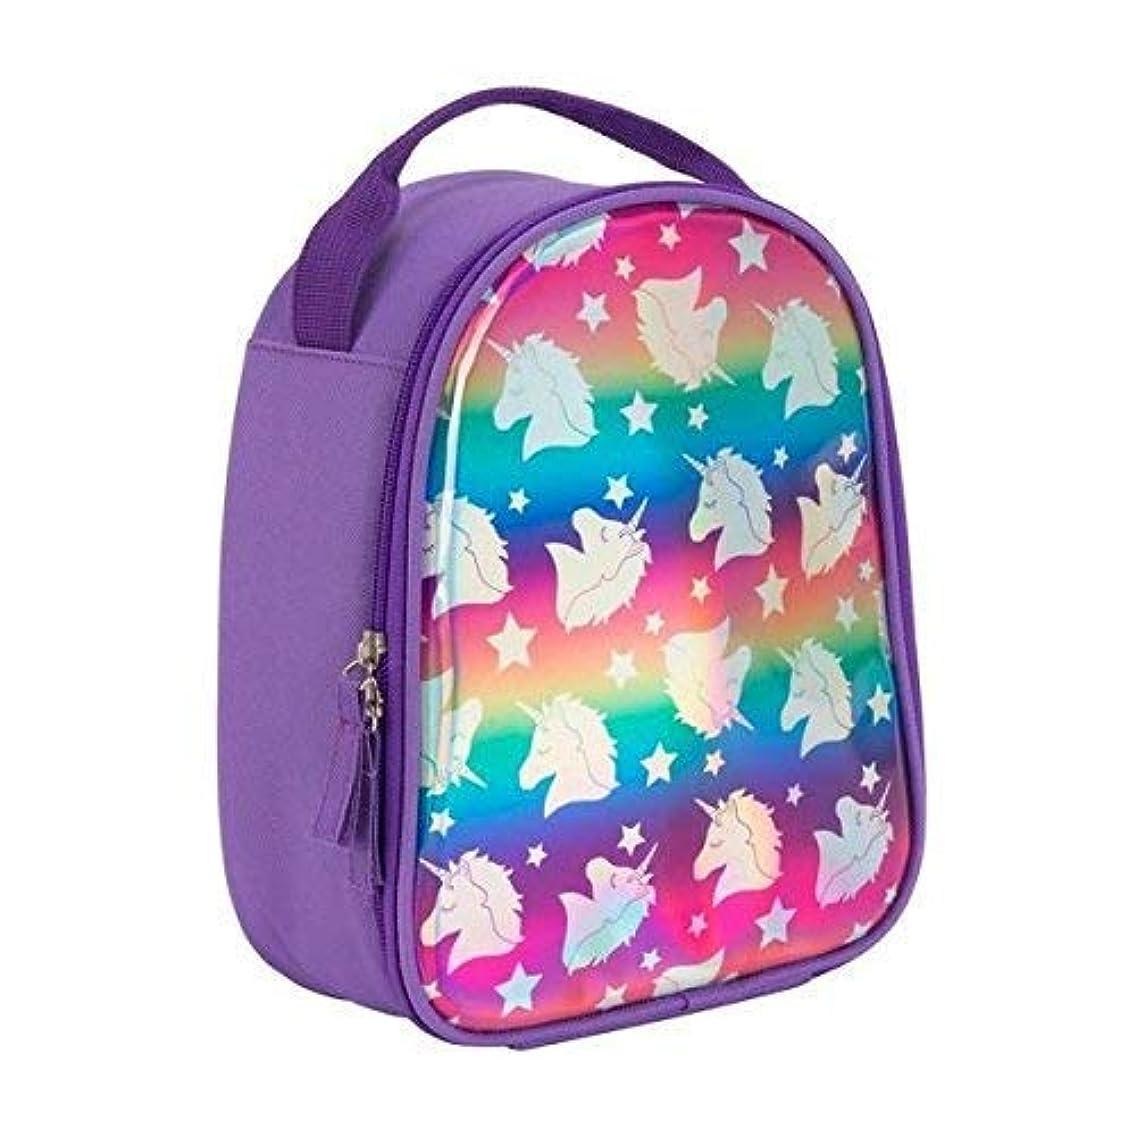 "3C4G 54408 Unicorn Hologram Lunch Box, 7.5"" x 9.5"" x 4"", Purple"